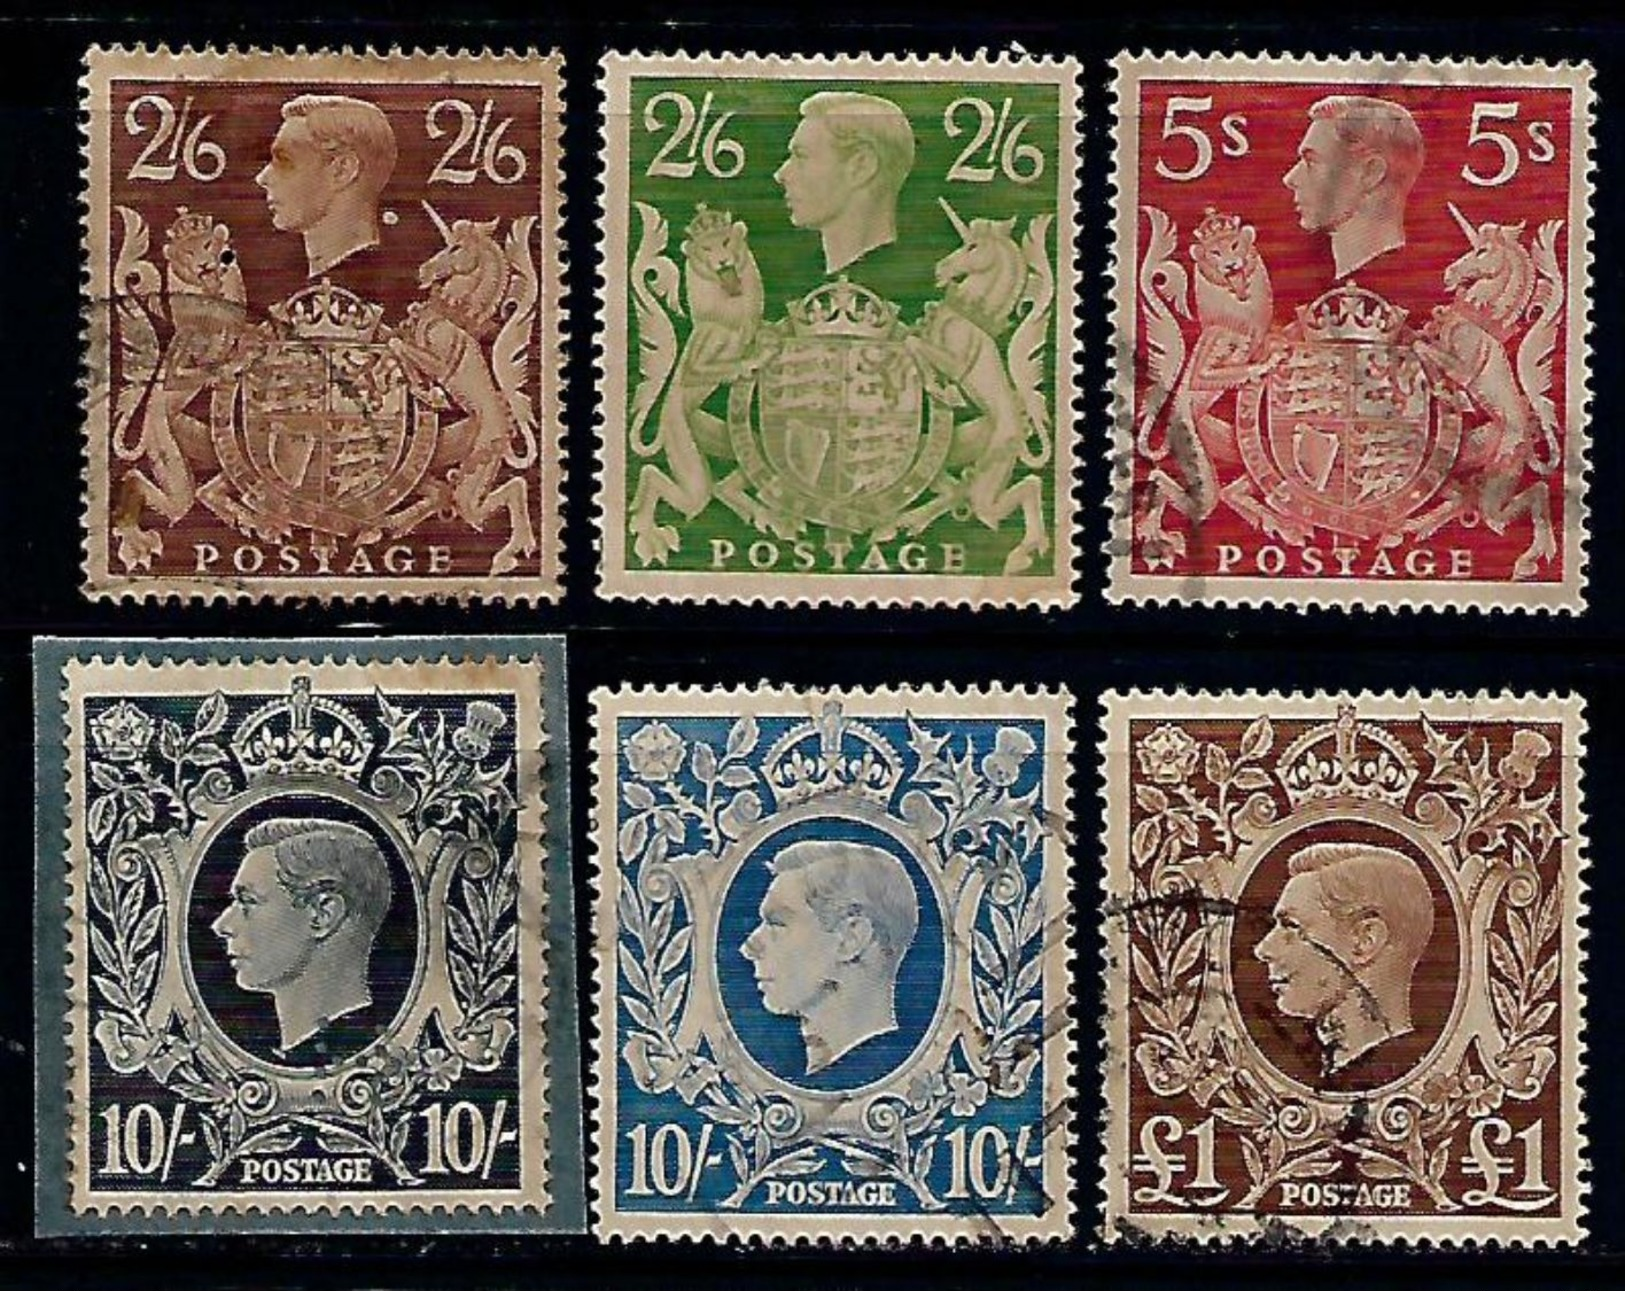 Great Britain GB George KGVI Value Used Stamps # AR:153 - 1902-1951 (Kings)